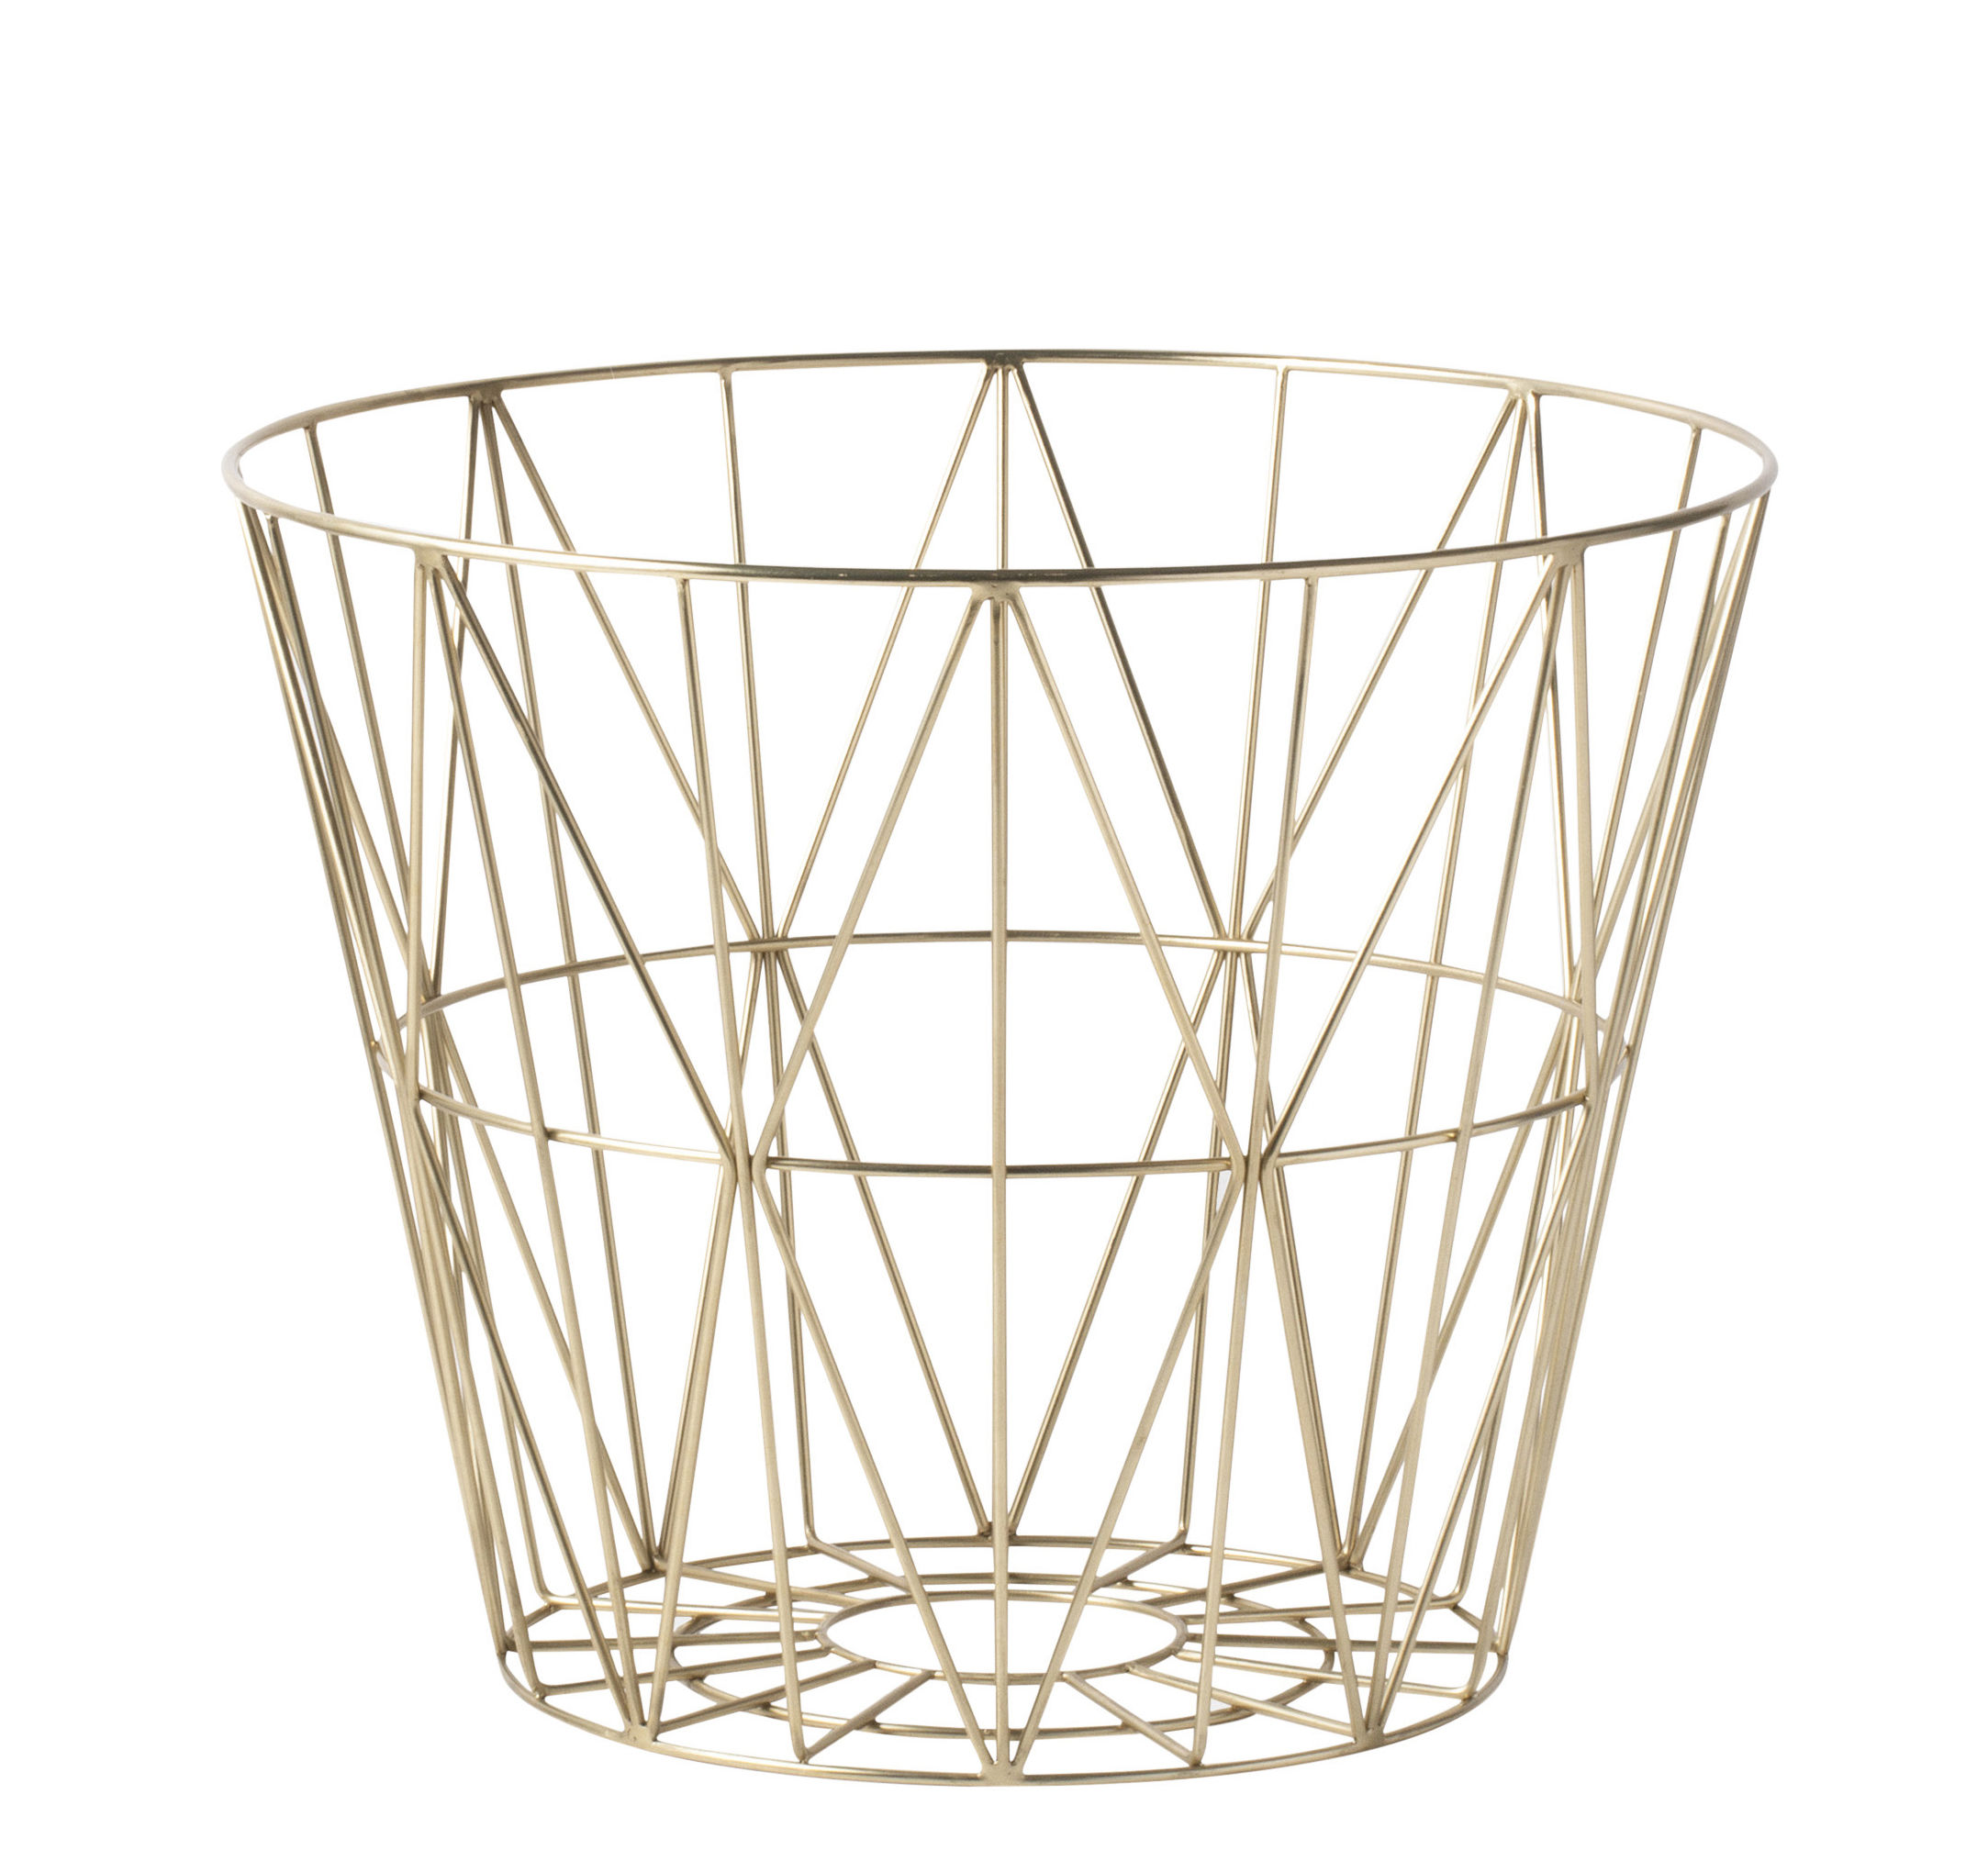 Dekoration - Tischdekoration - Wire Small Korb / Ø 40 cm x H 35 cm - Ferm Living - Messing - Métal plaqué laiton